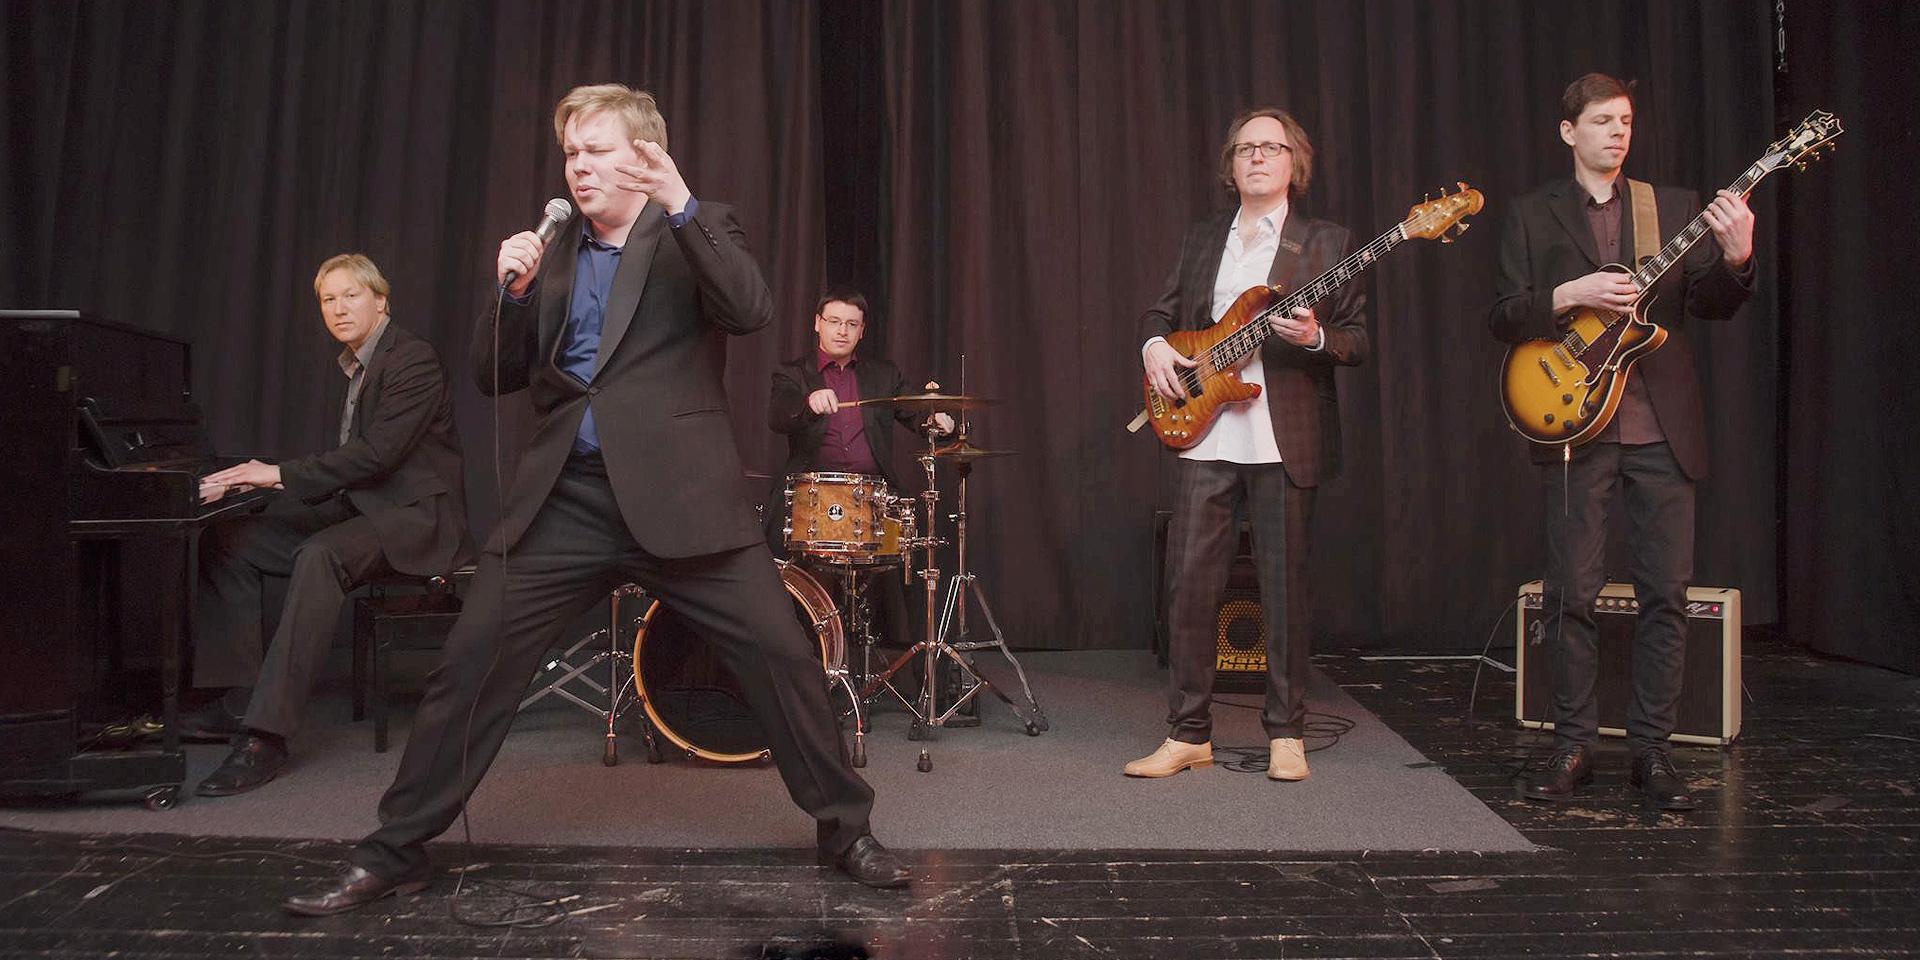 Steve Urban Band - Galeriebild